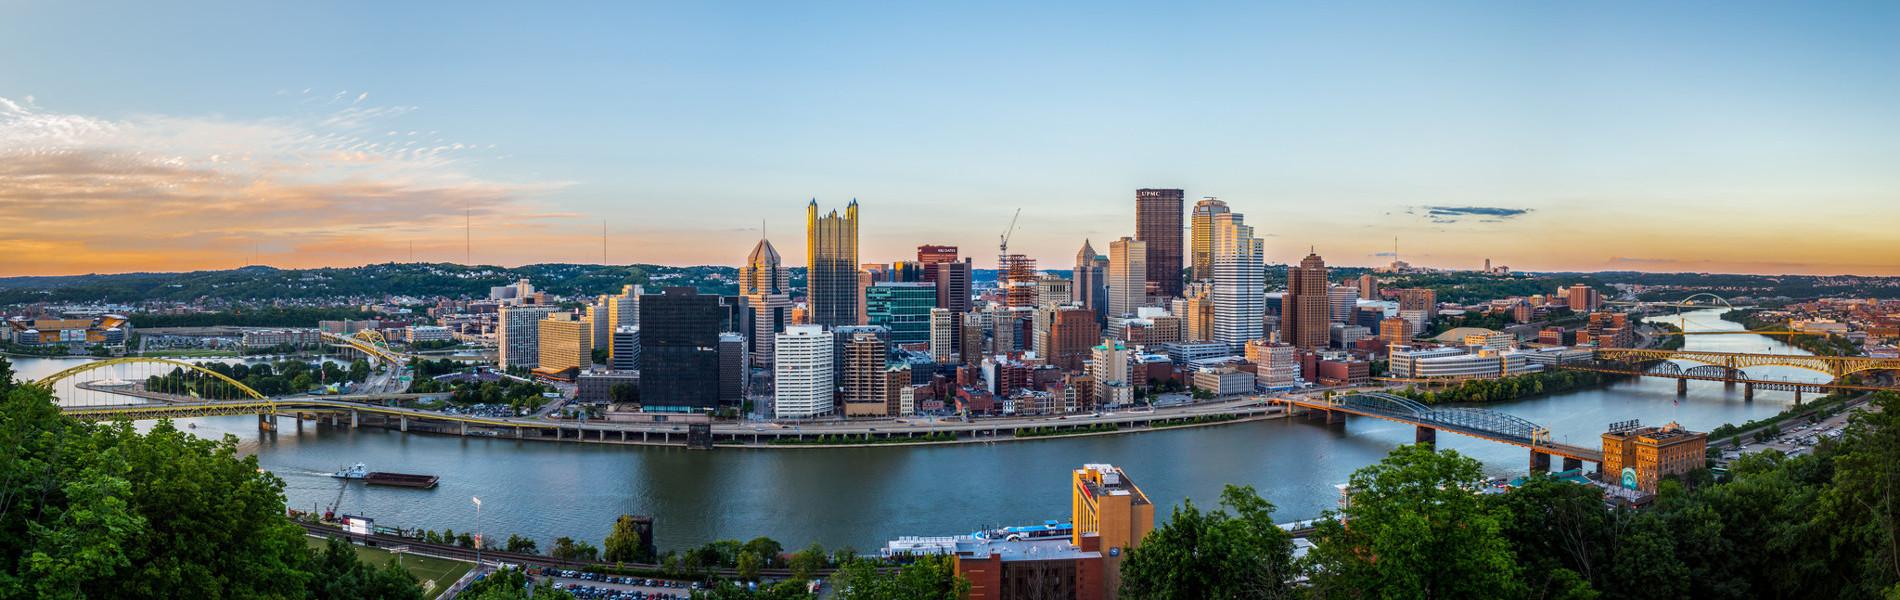 Transforming Urban Transportation - Pittsburgh Skyline